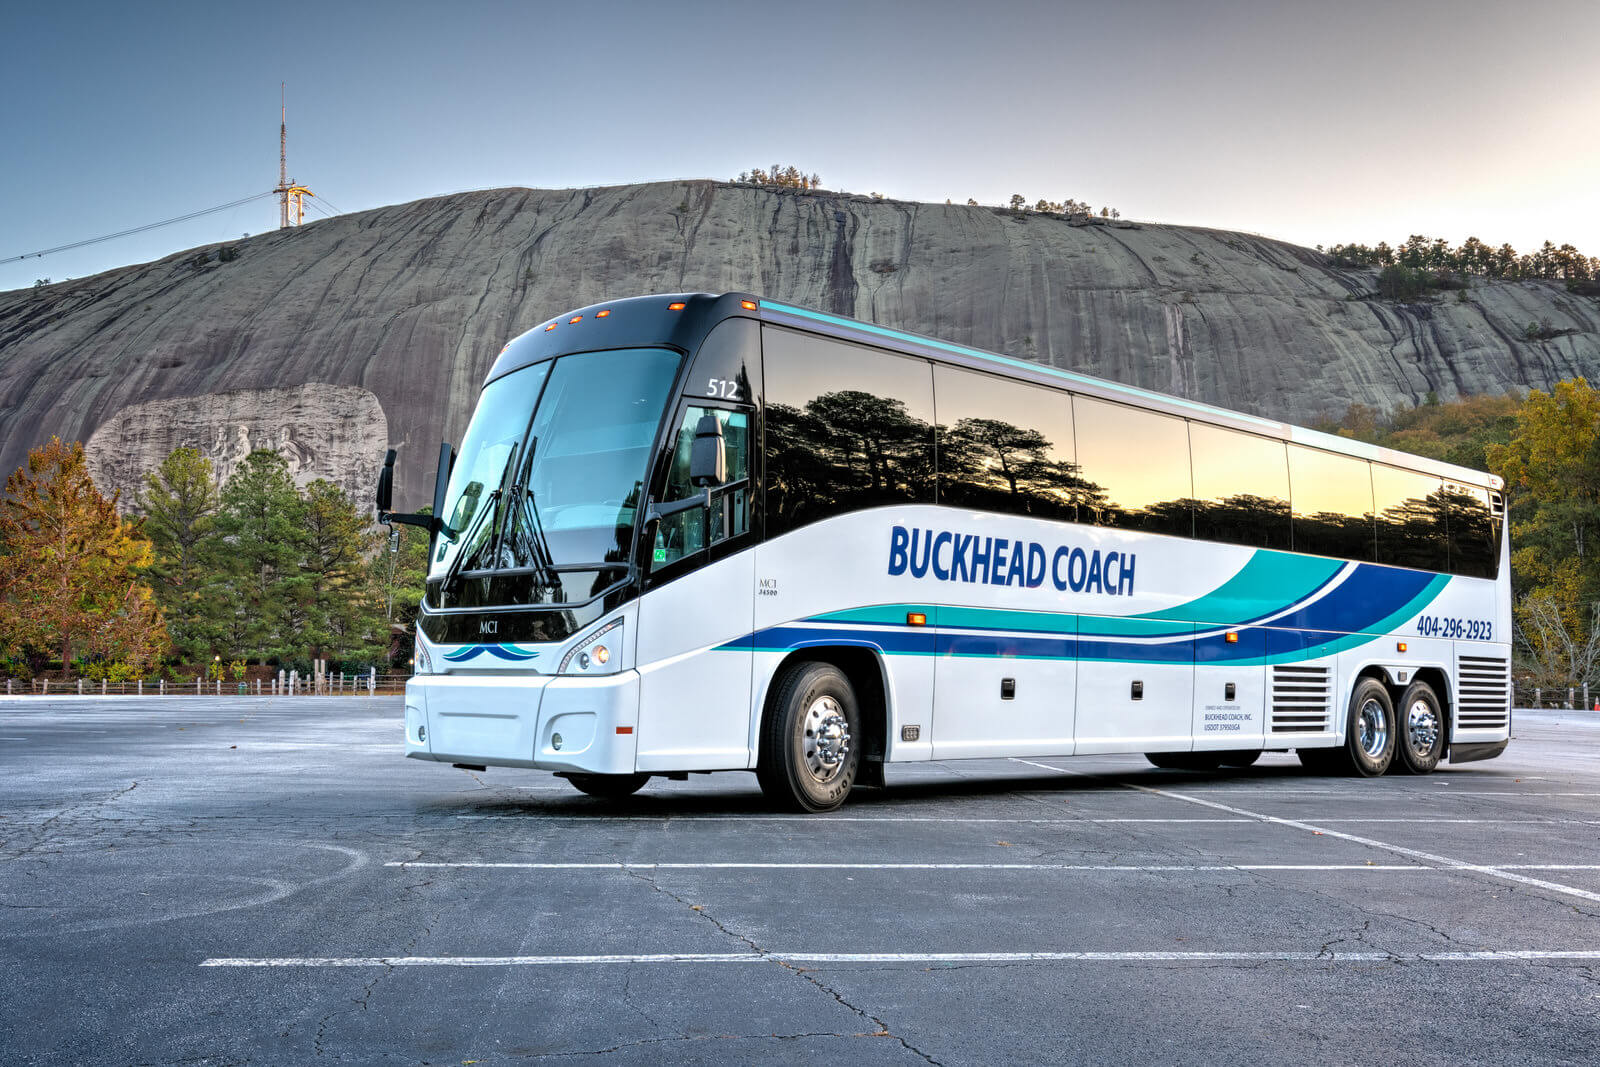 buckhead-coach-512-1